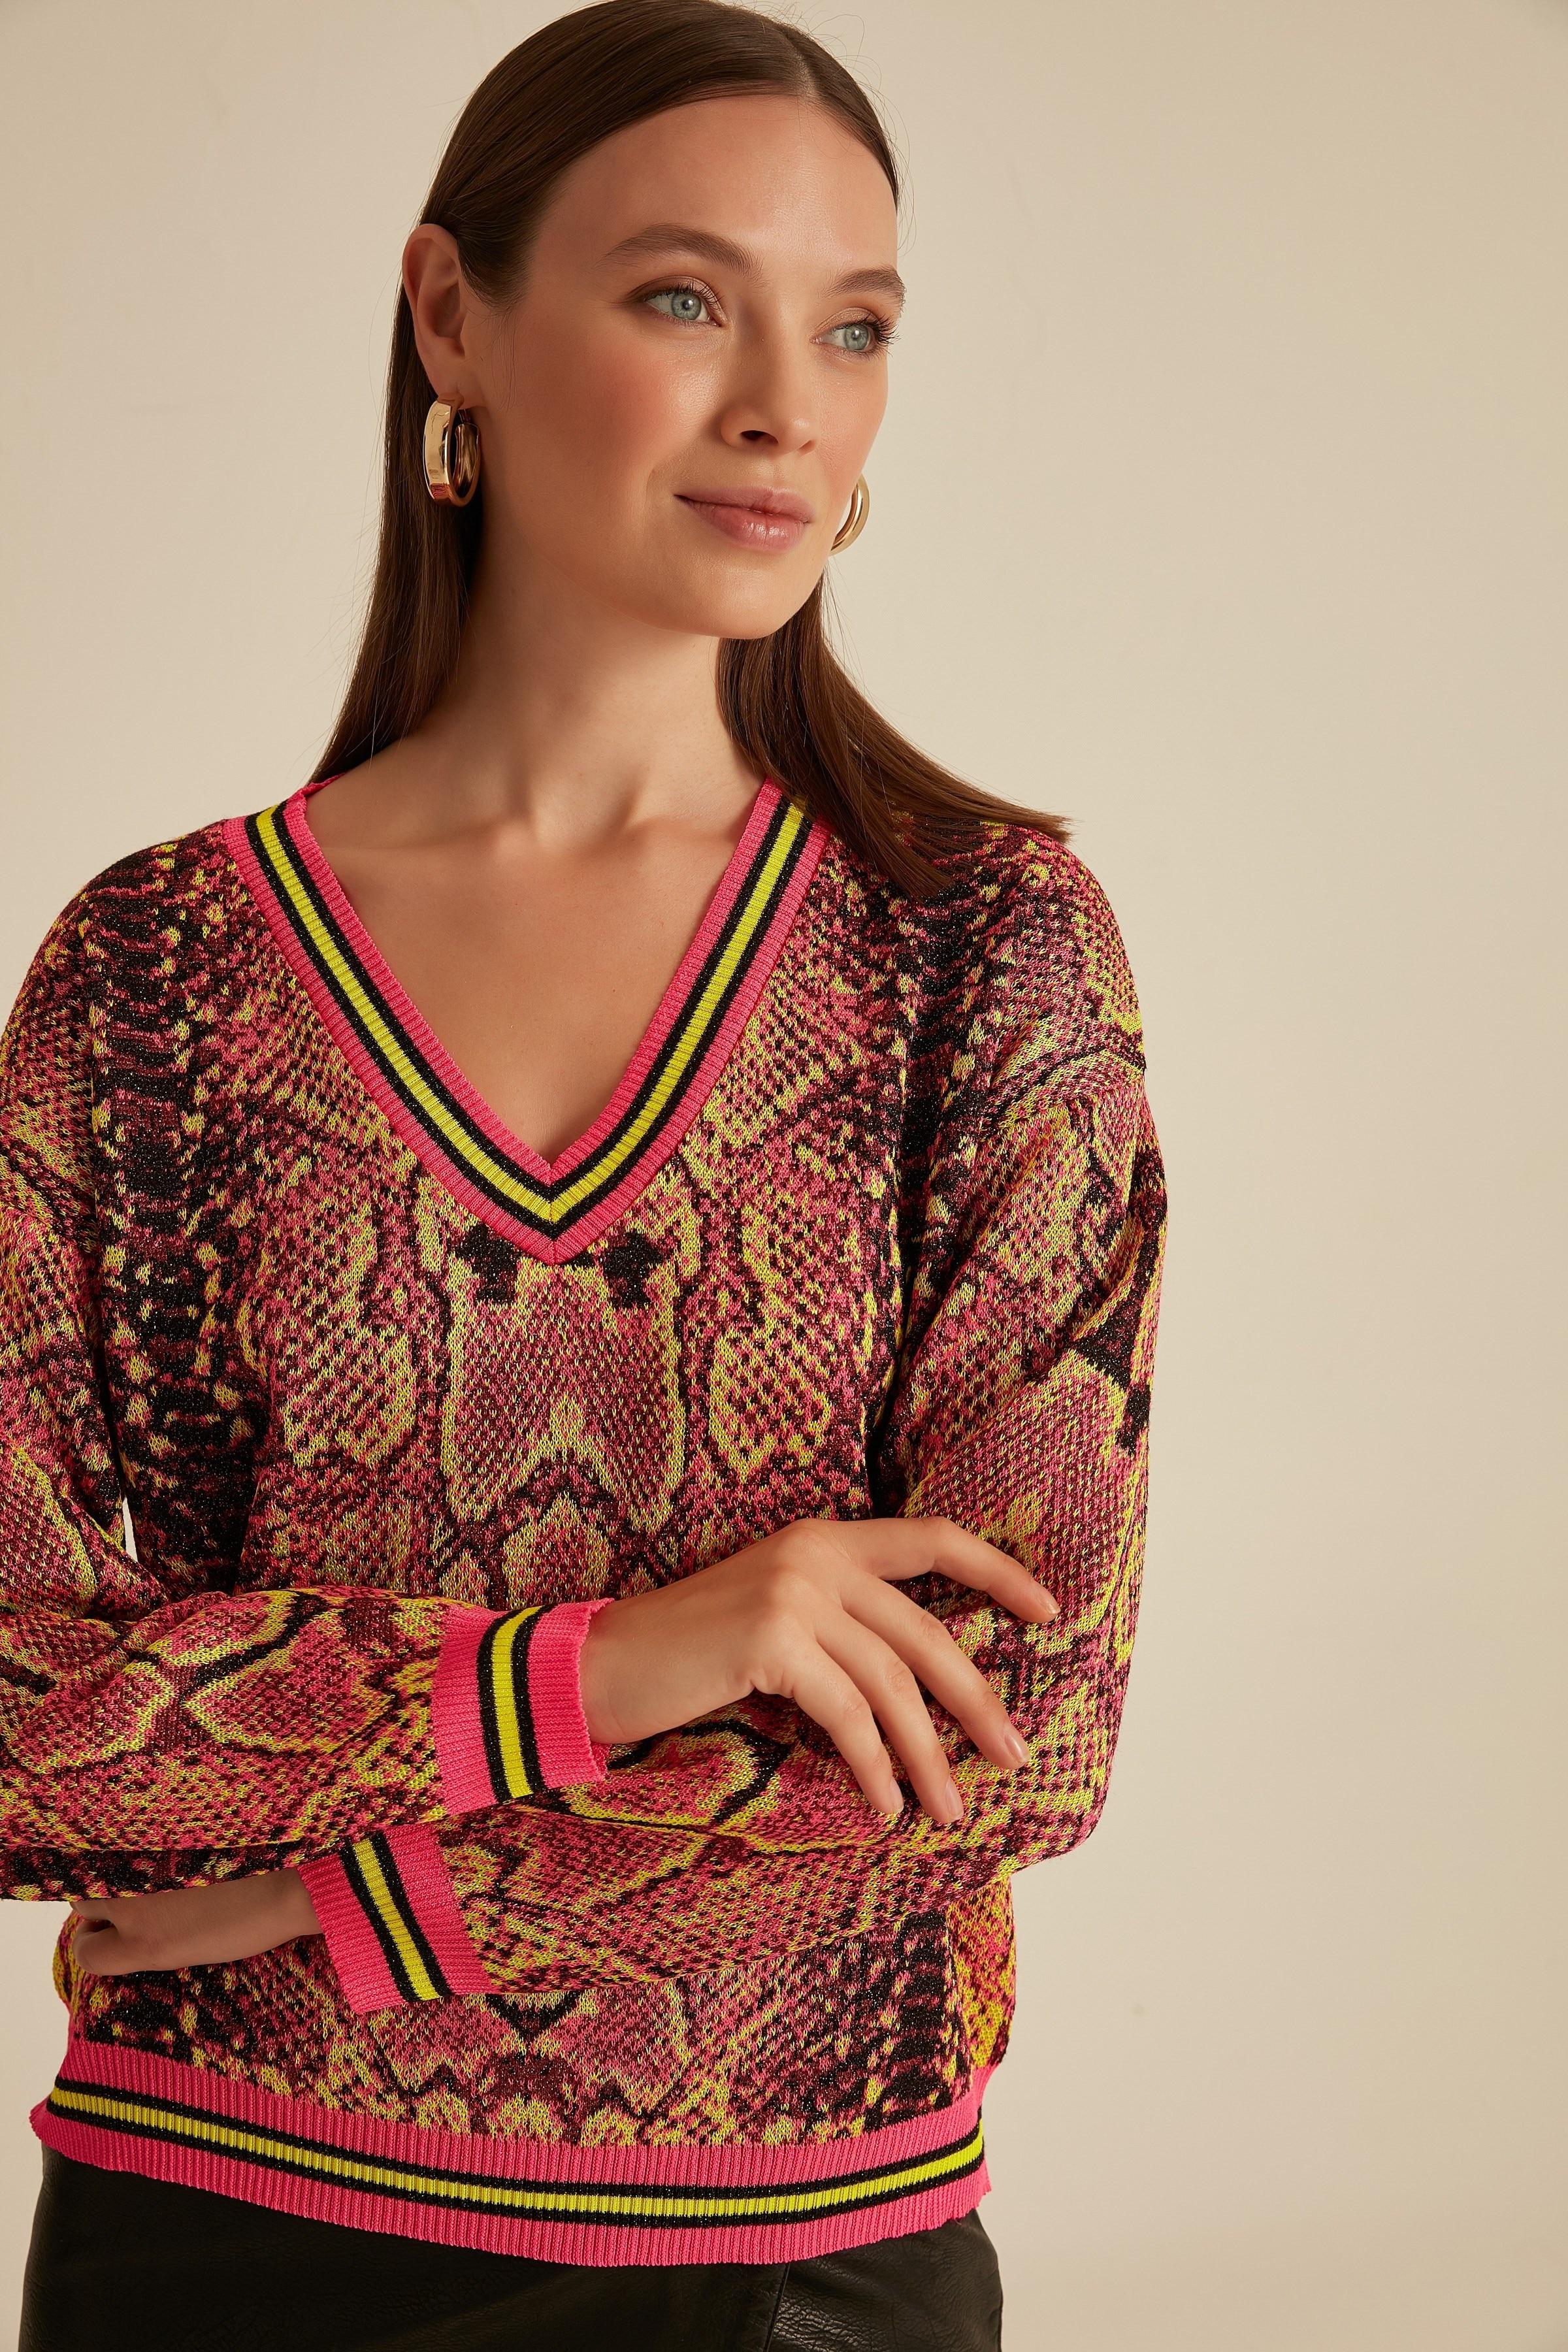 Snake Pattern V-Neck Neon Multi Sweater Sweater-Neon Multi